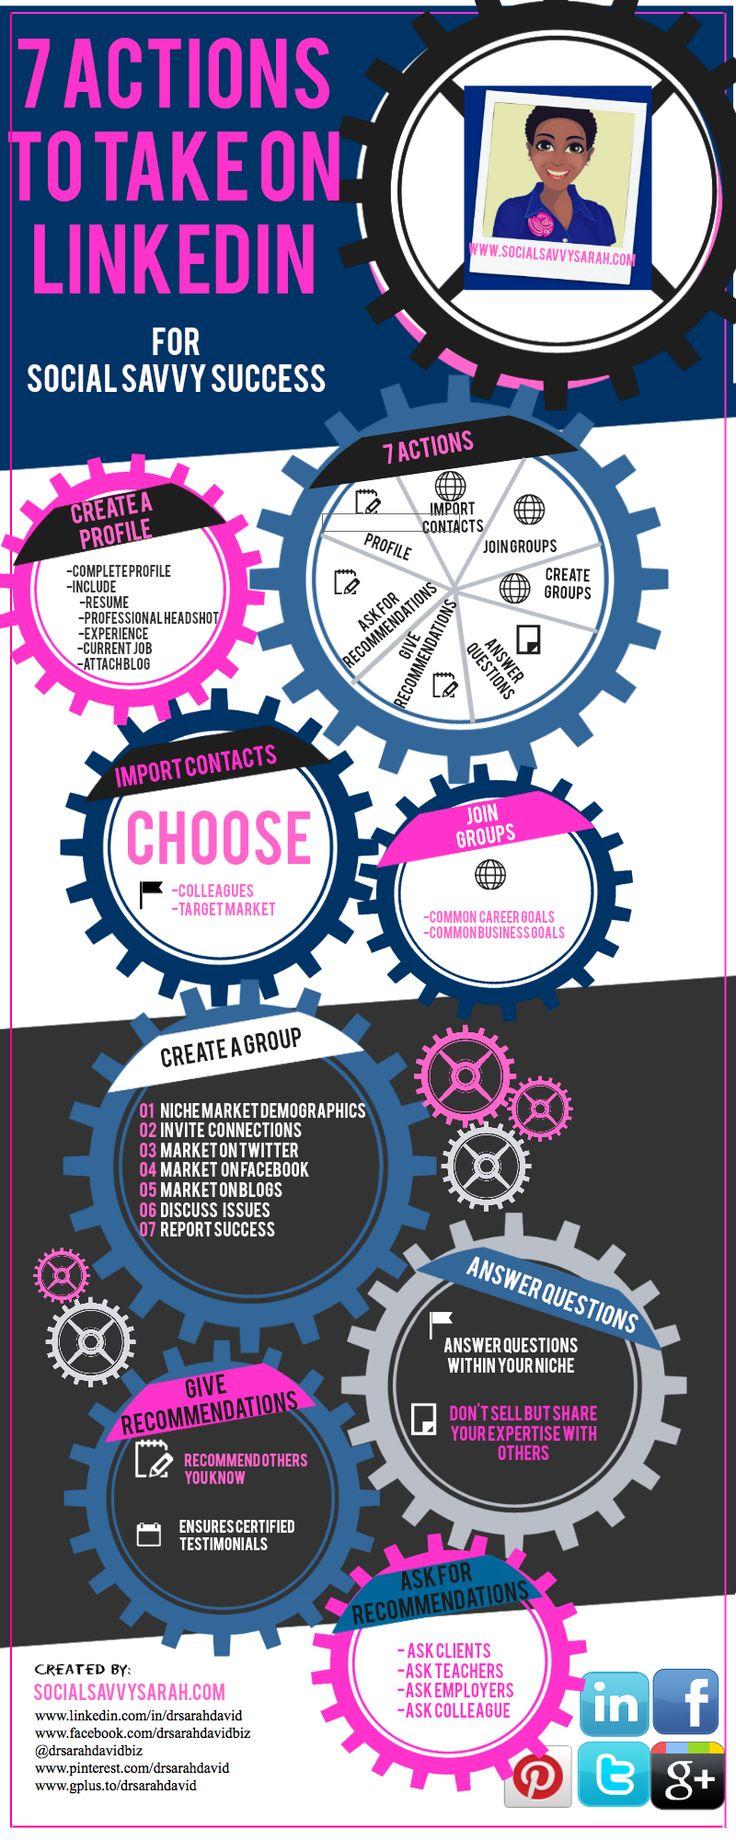 7 acciones a realizar ahora en Linkedin para tu empresa #infografia #infographic #socialmedia